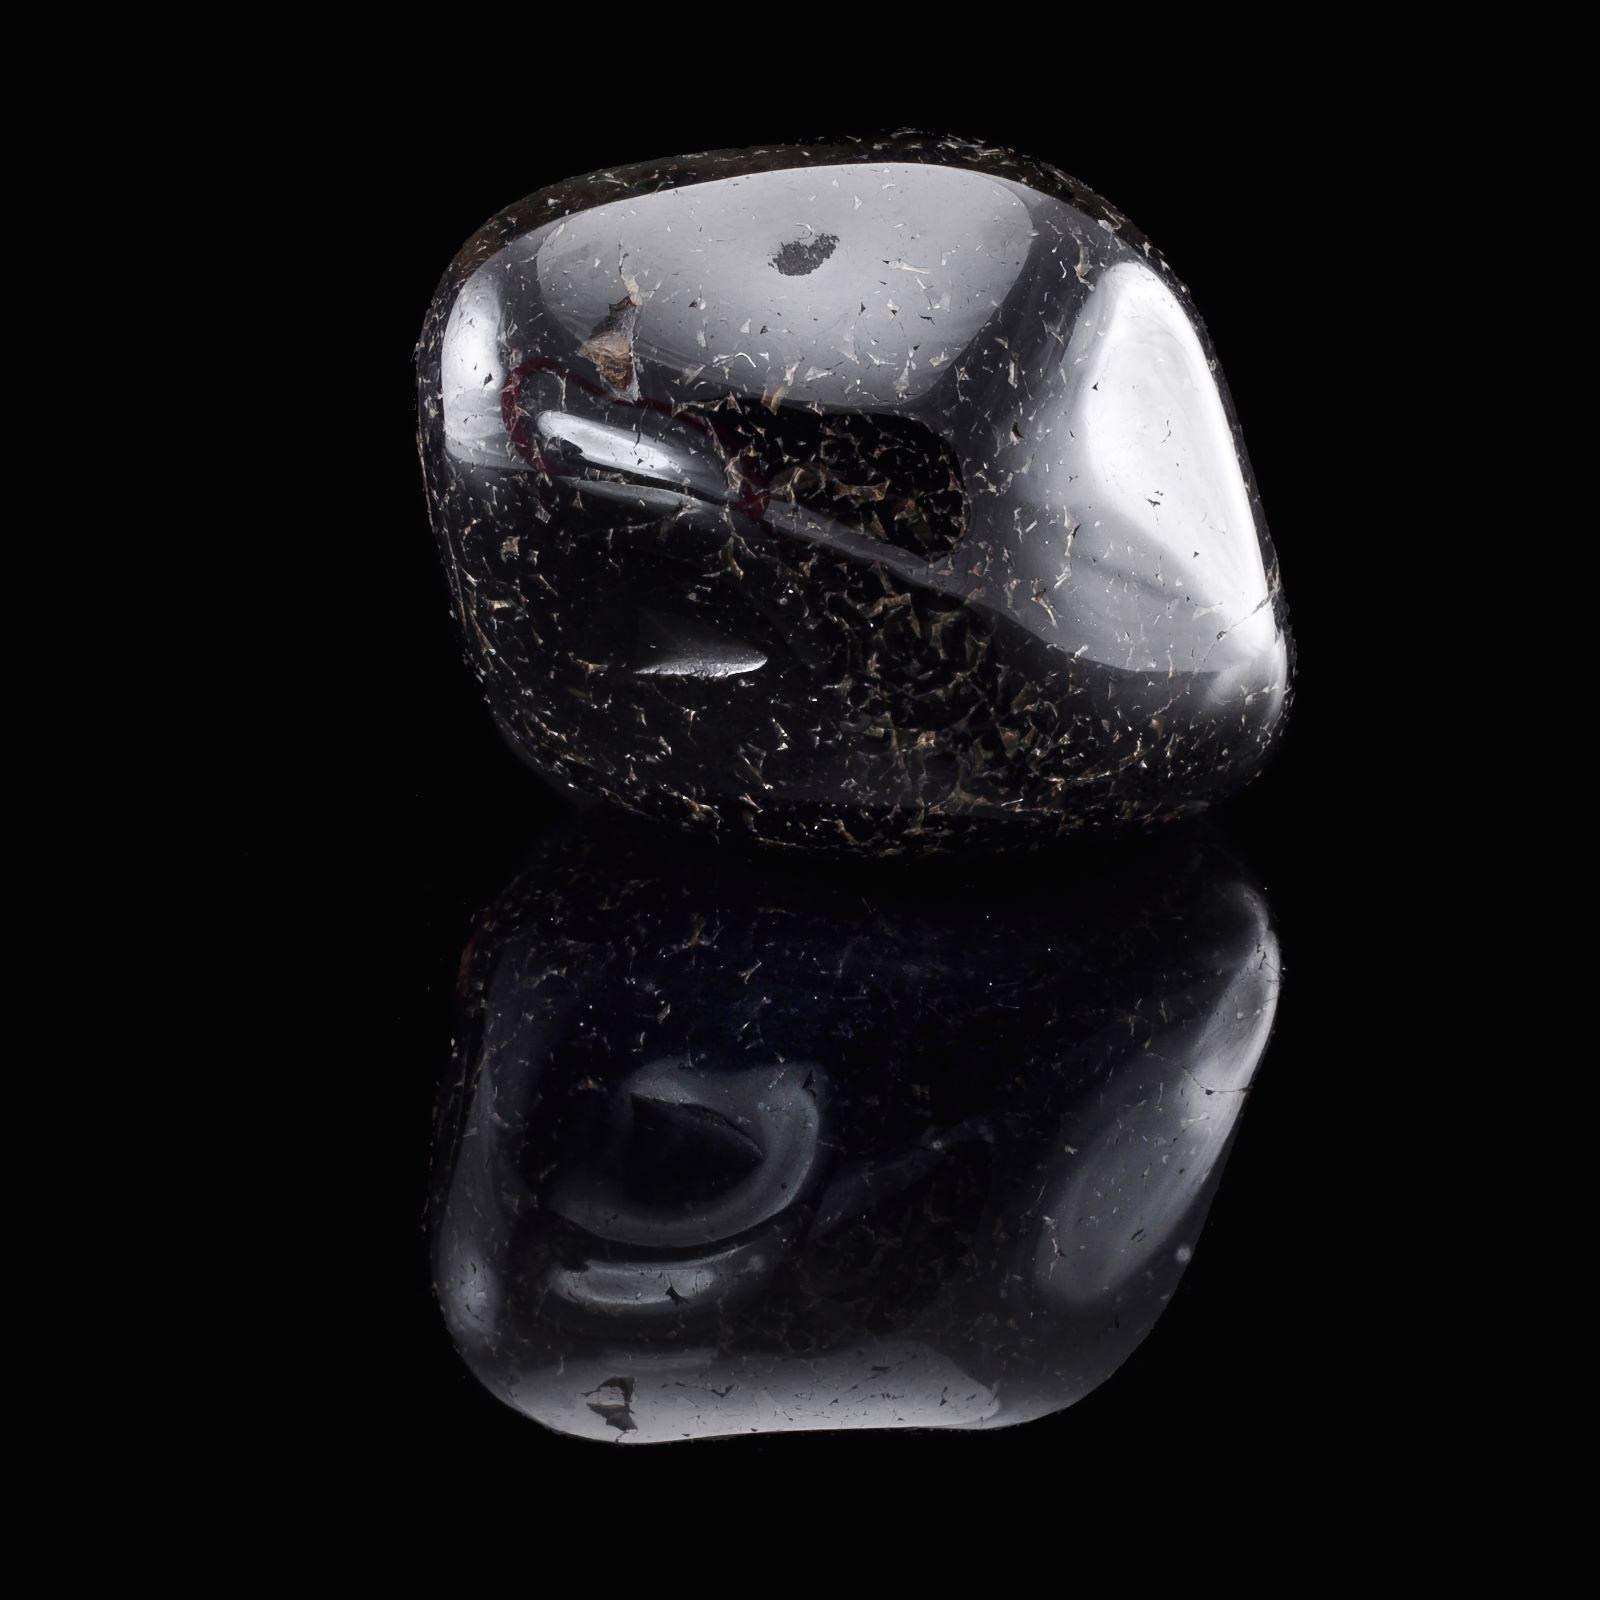 Schwarzer Onyx-Stein